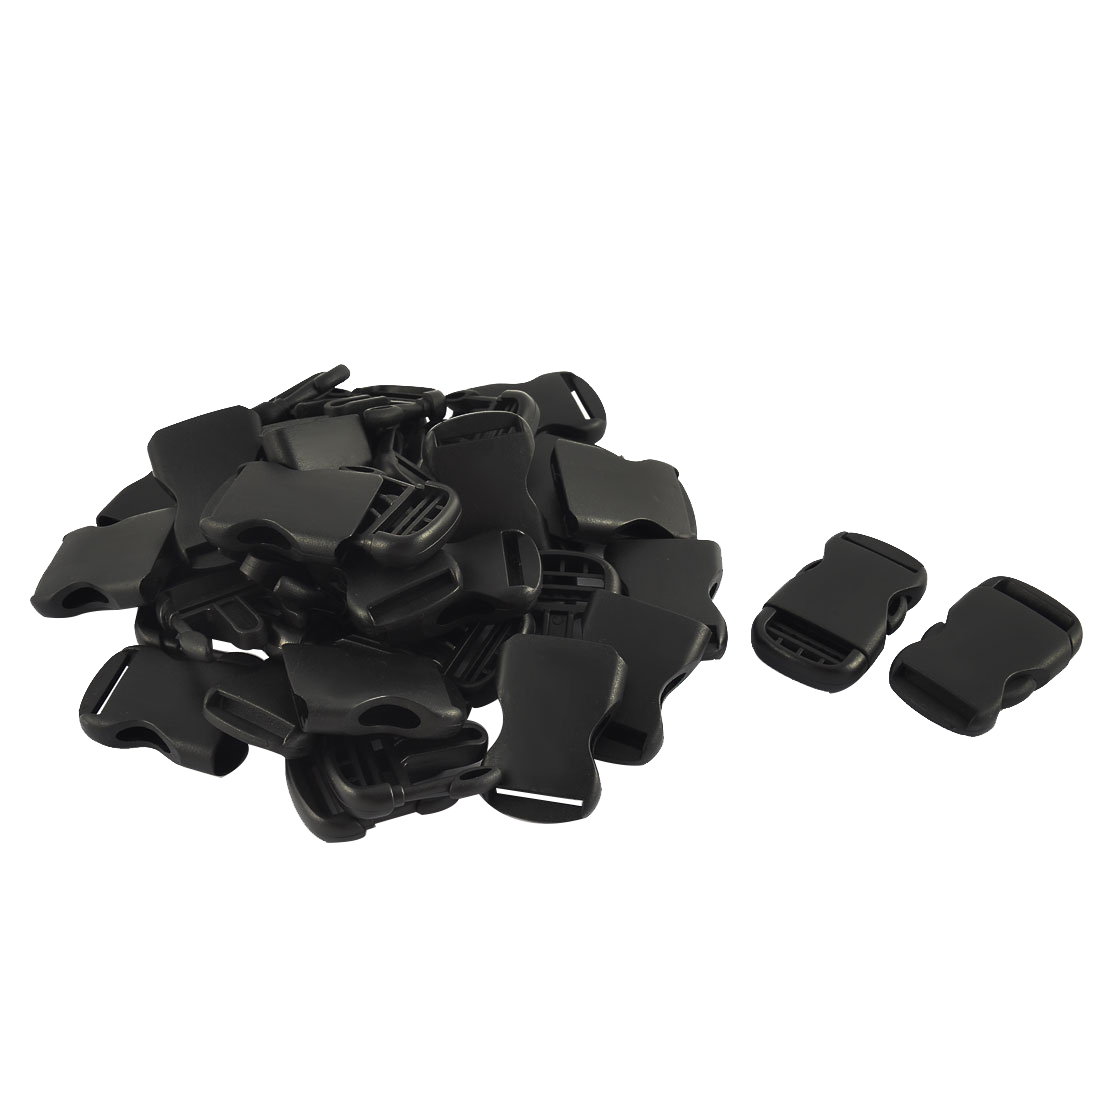 Rucksack Bag Plastic Side Quick Release Buckle Black 26mm Strap Width 20pcs